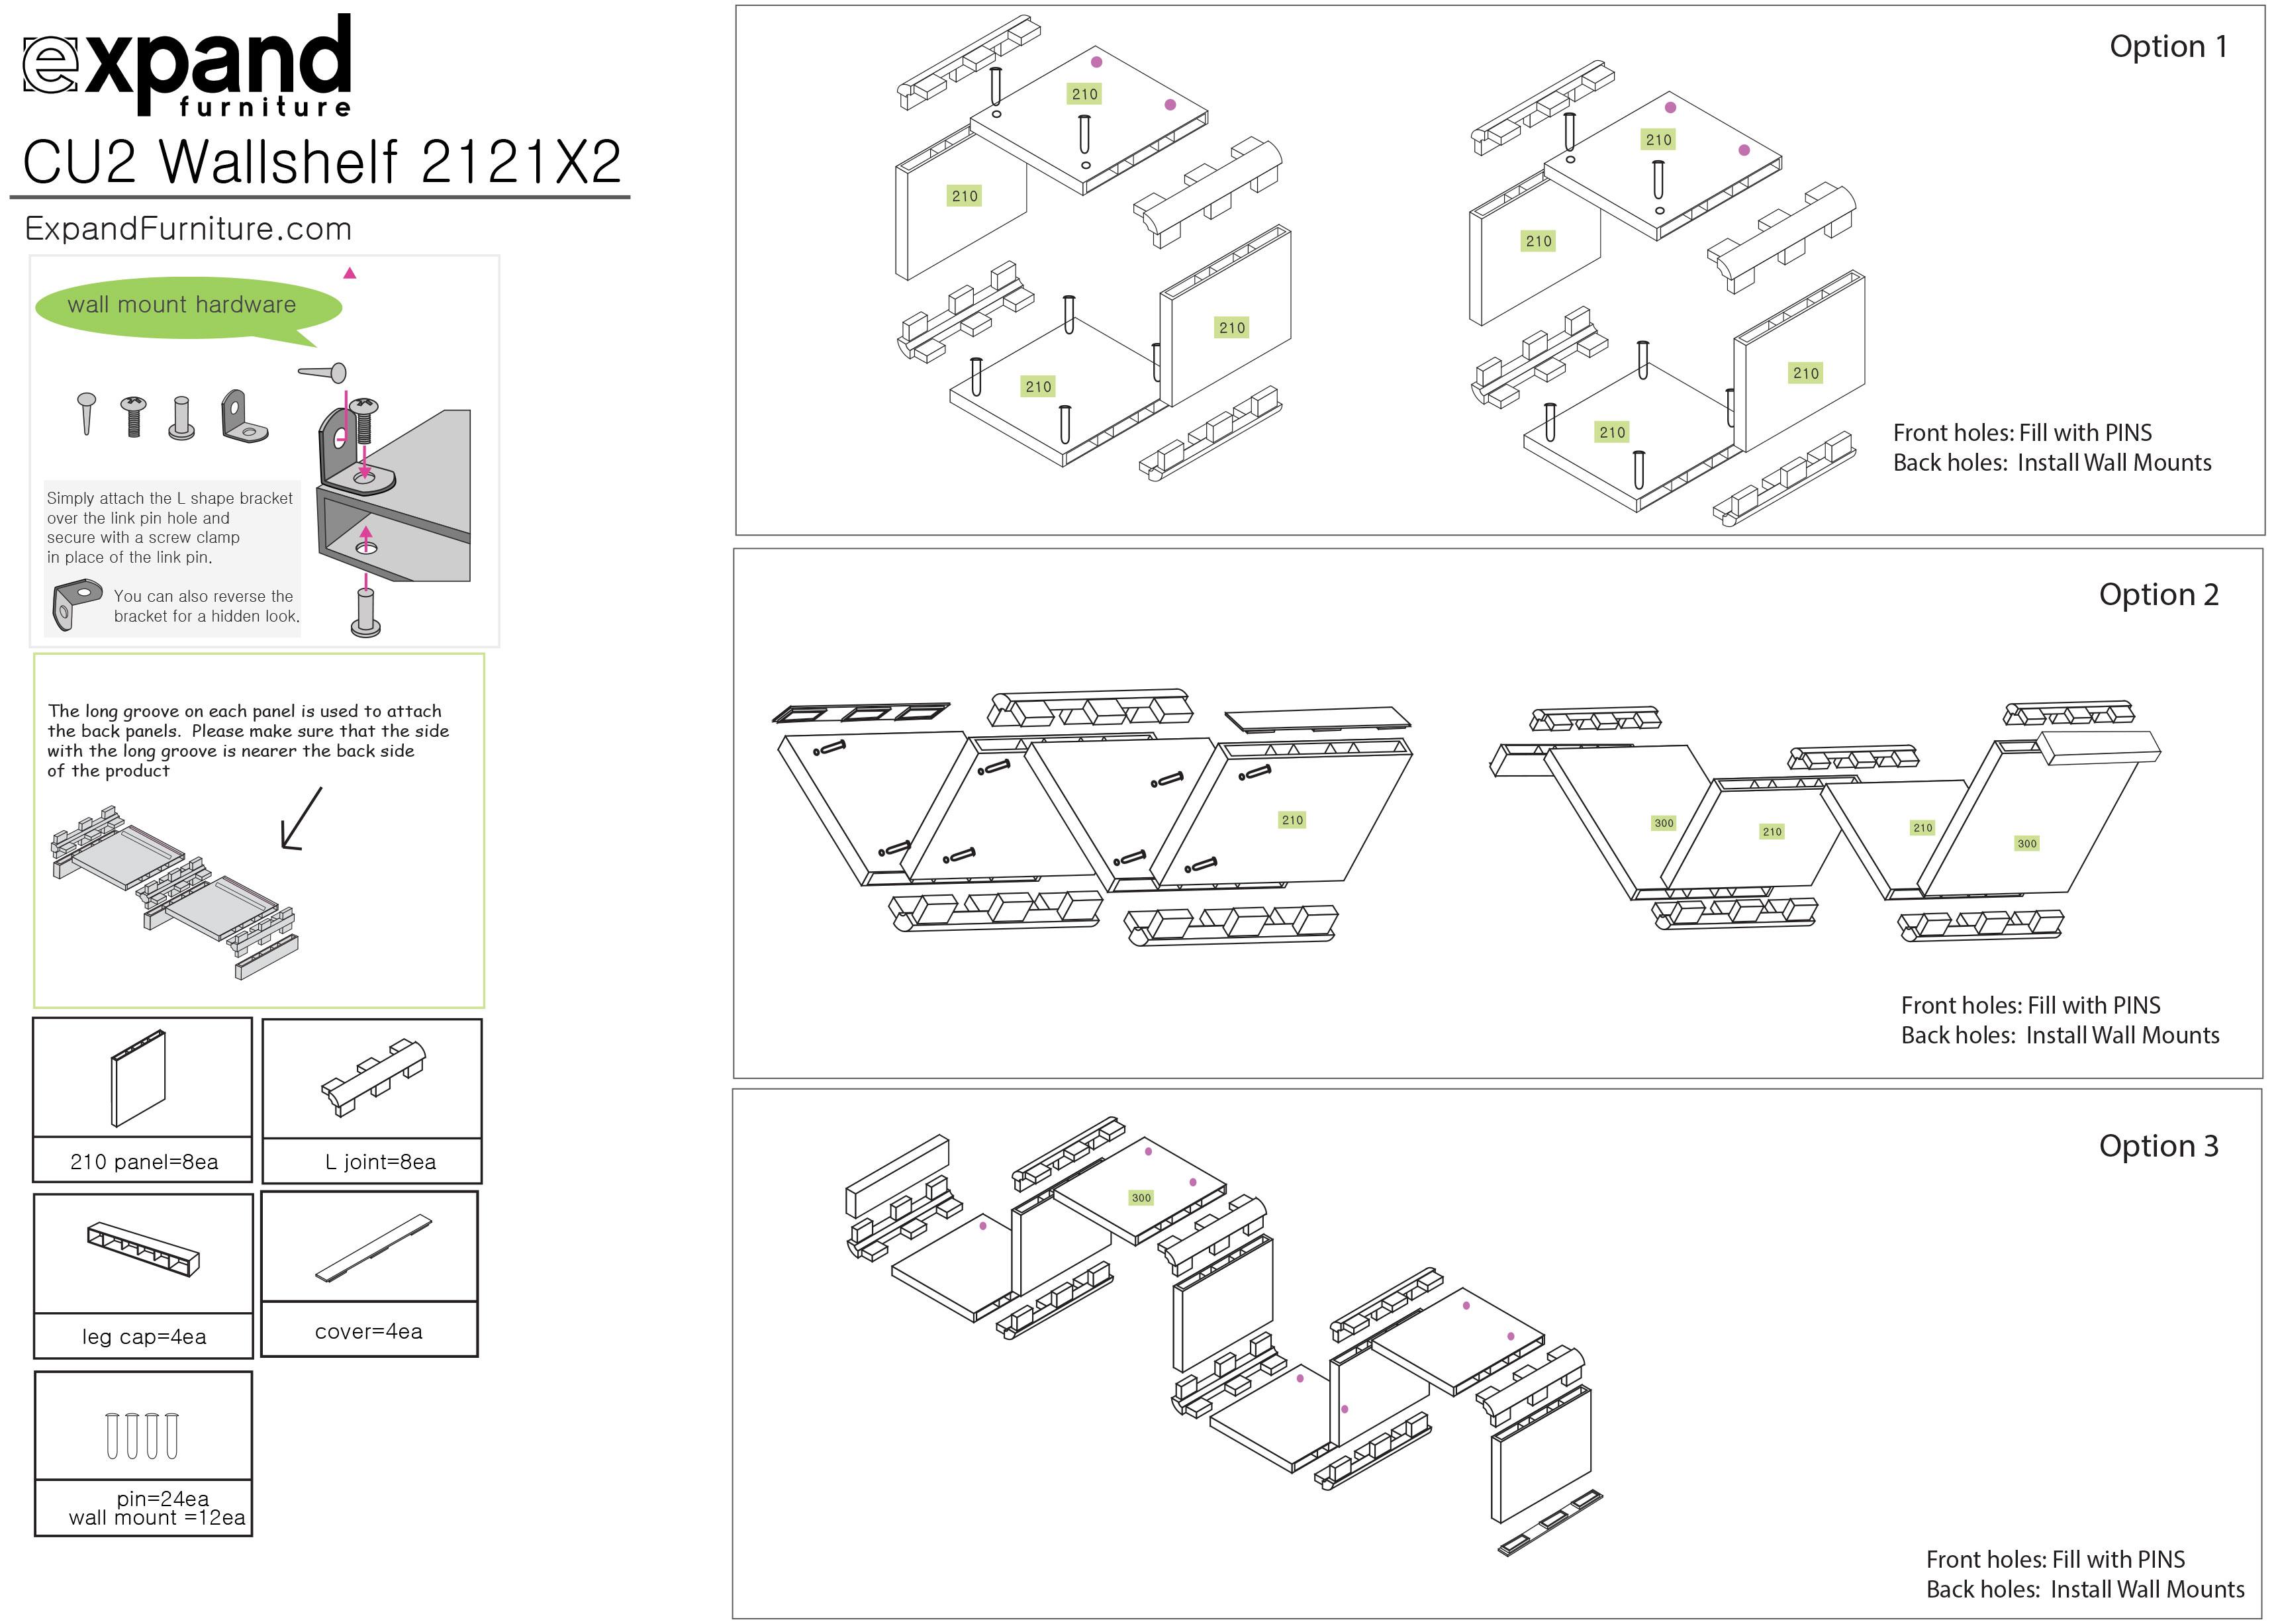 2121x2 unique cube wall shelves expand furniture prev ccuart Images